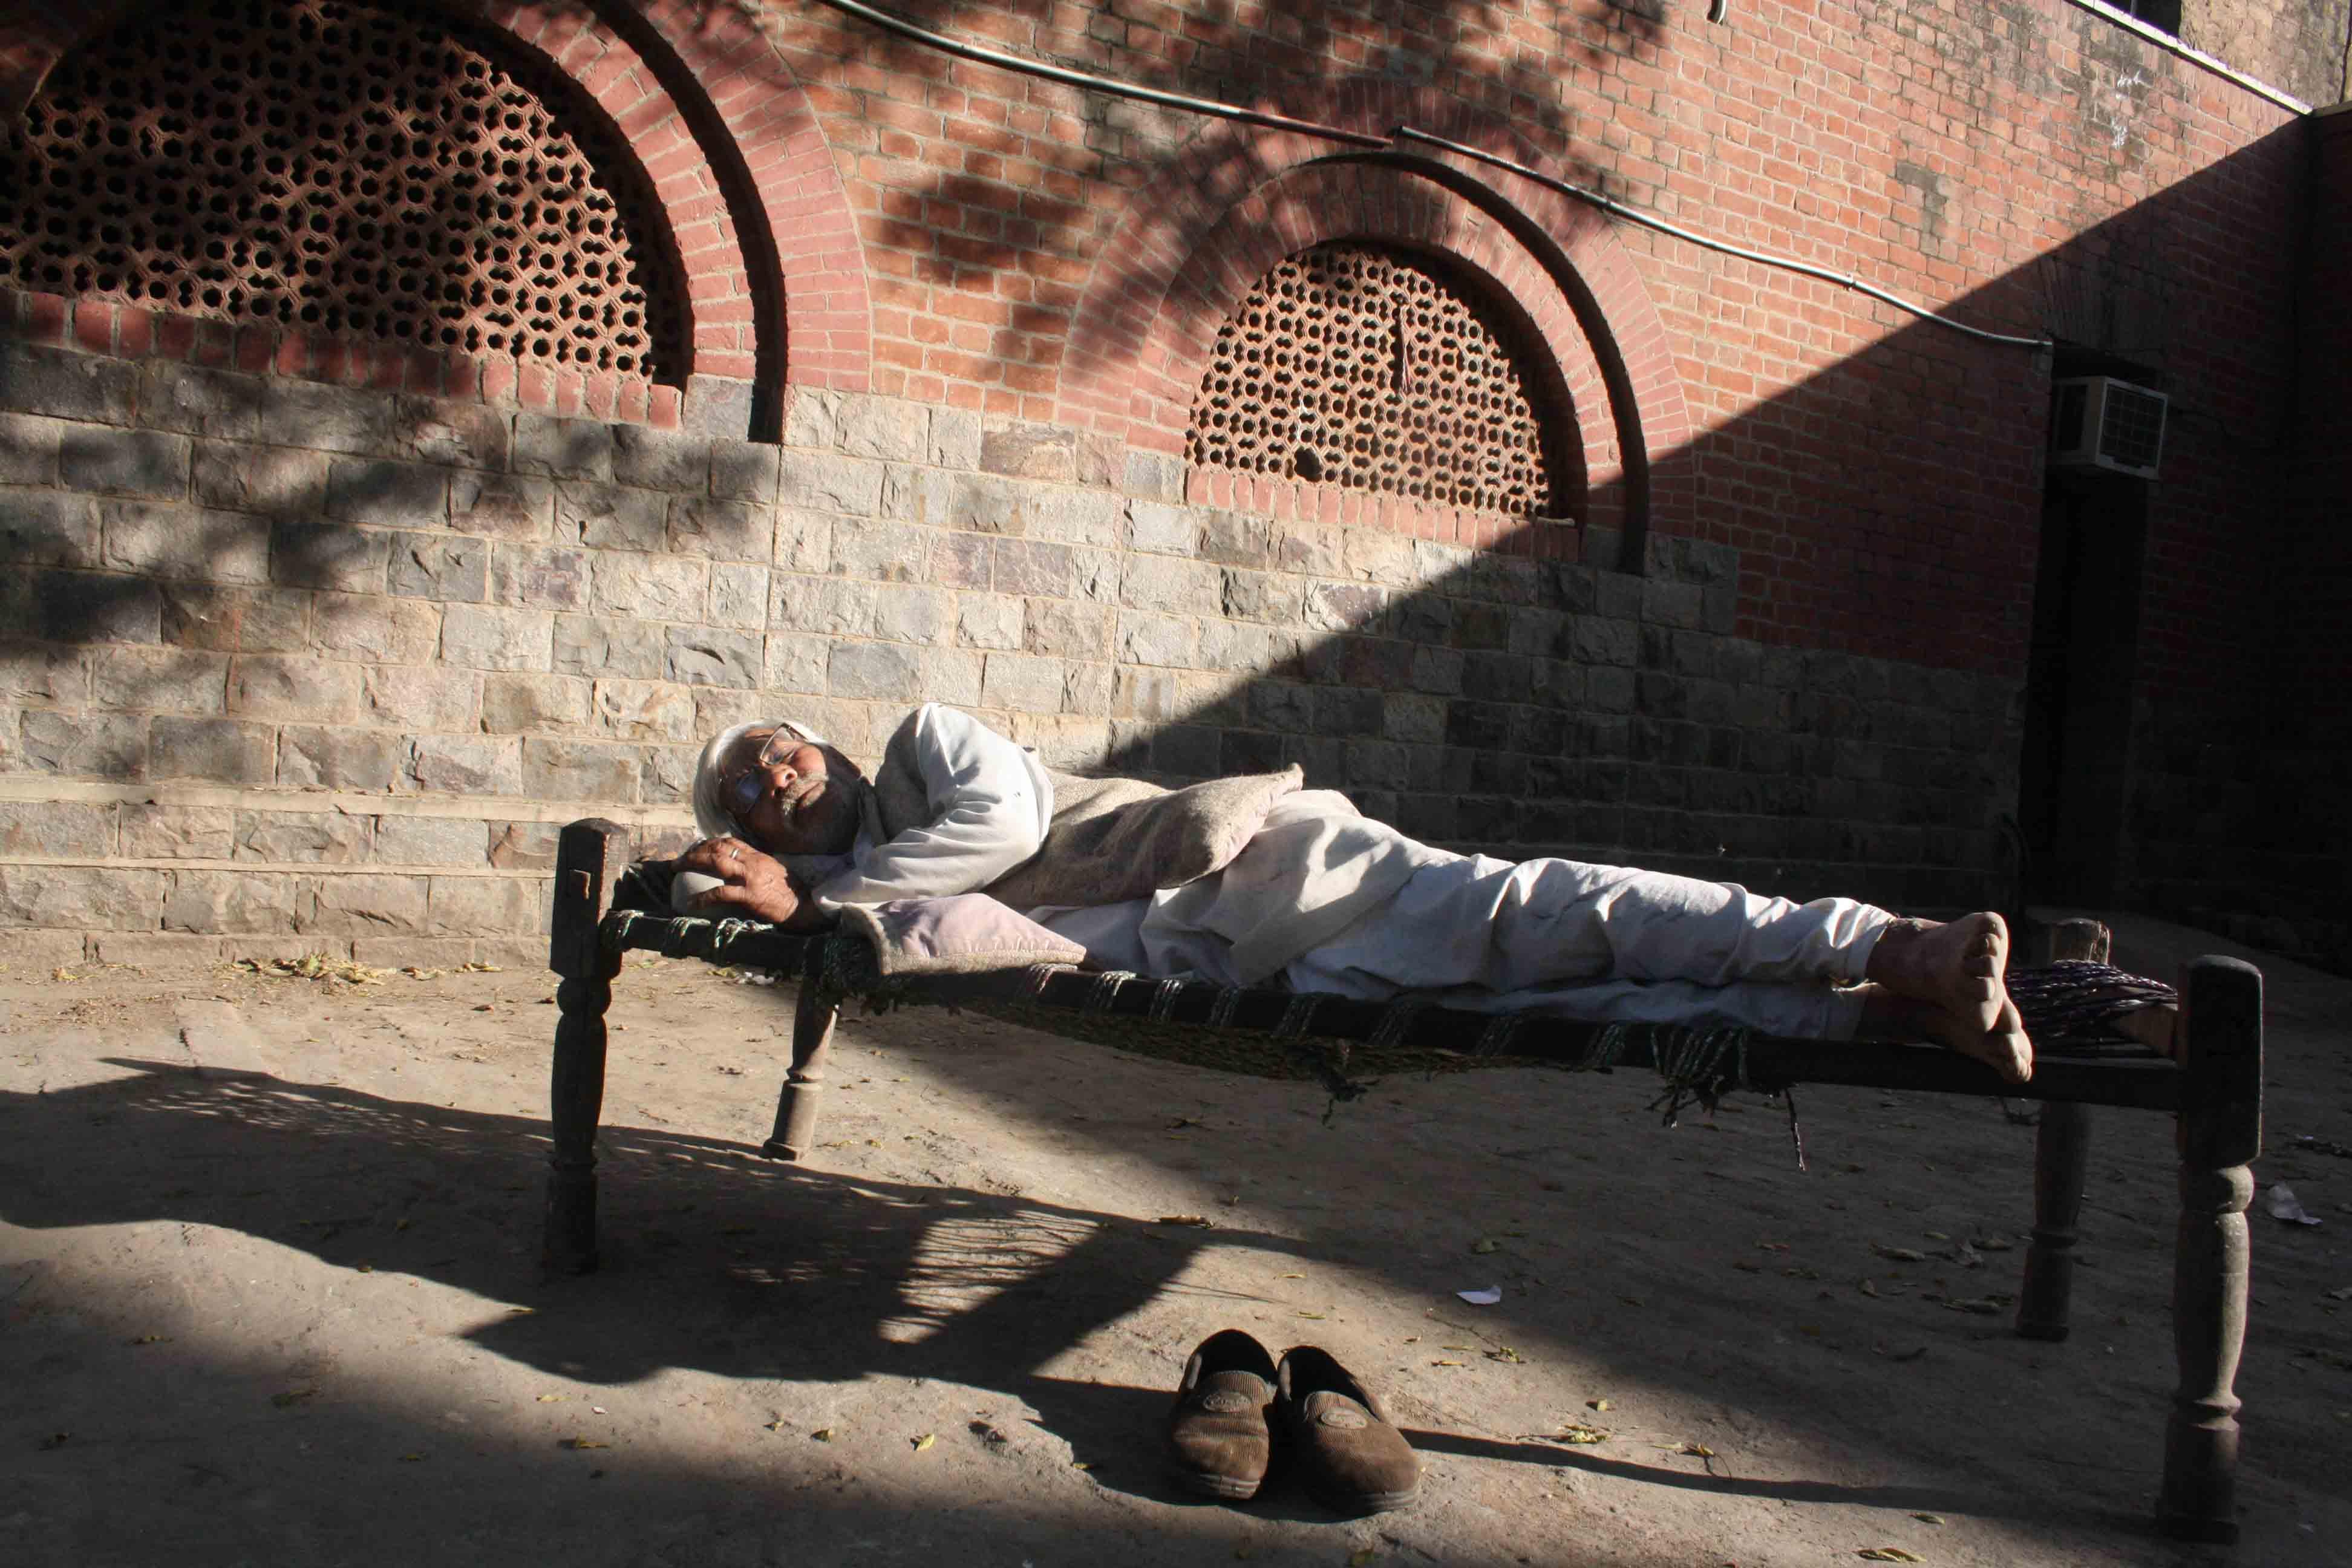 City Obituary – Historian Ramachandra Guha On Rohtas, The Samosa Man of St Stephen's College